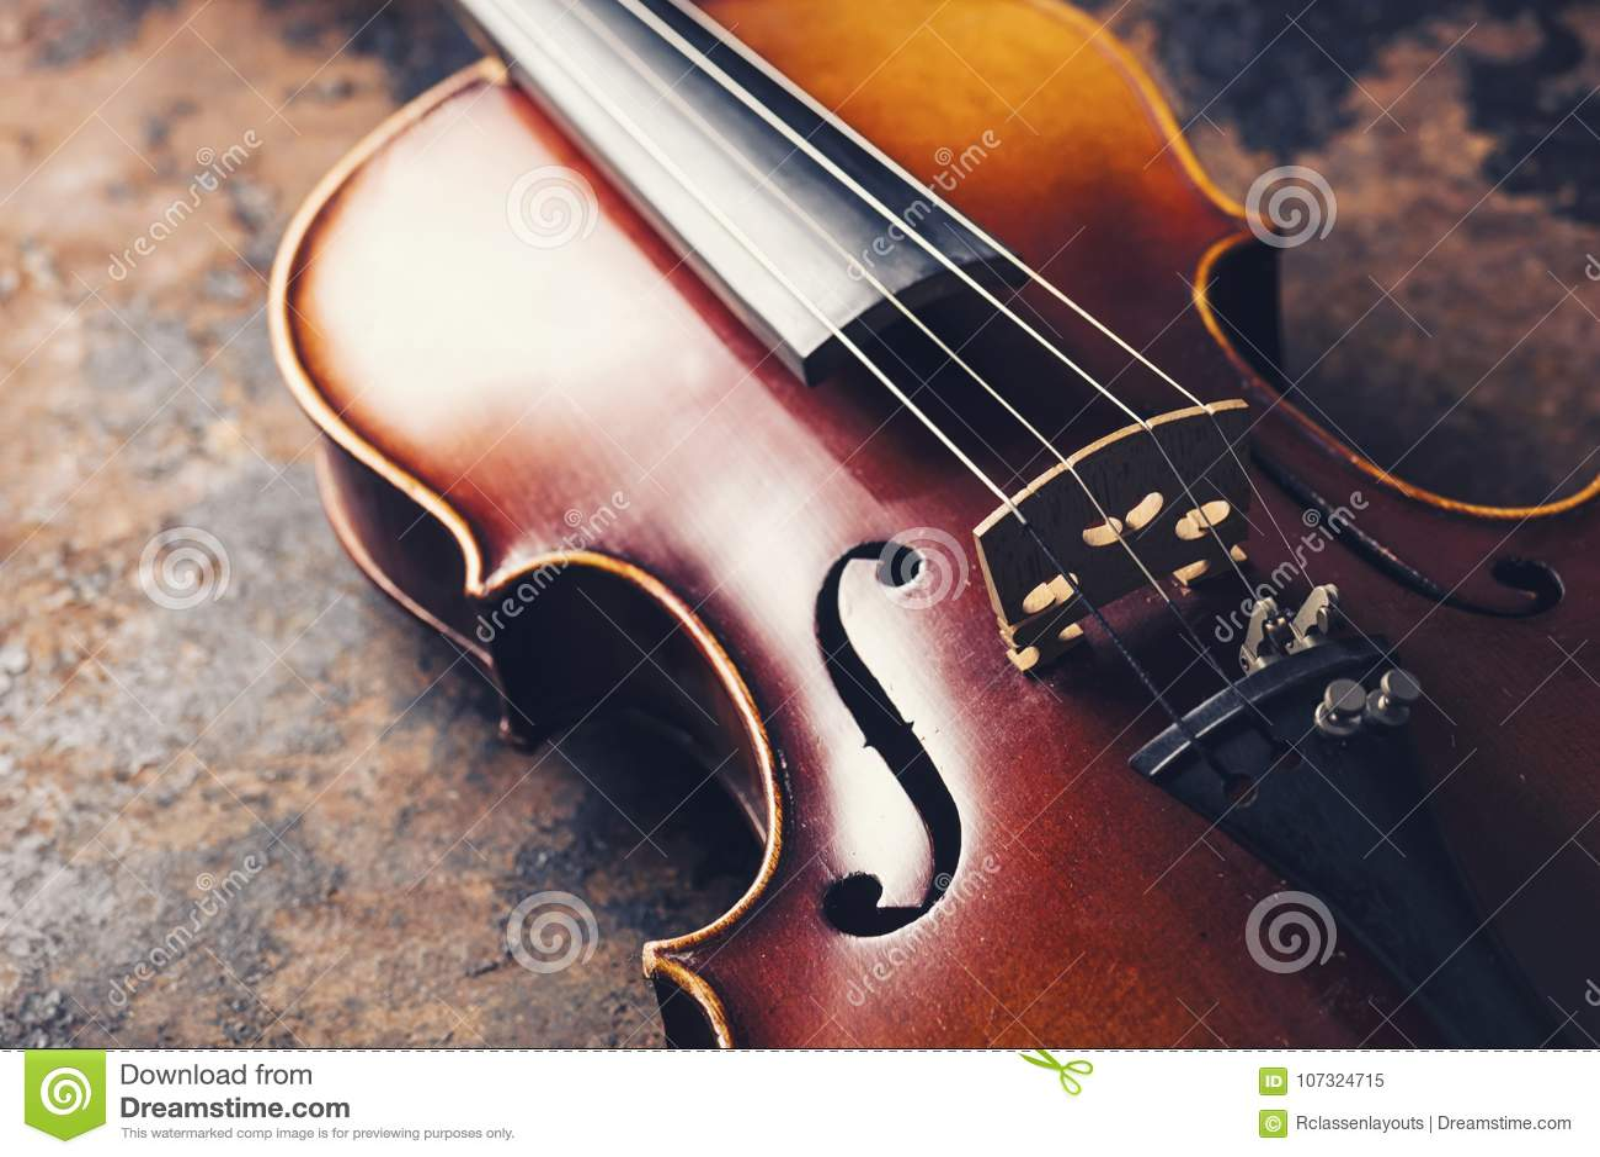 Old Antique Stradivarius Violin Stock Image - Image of